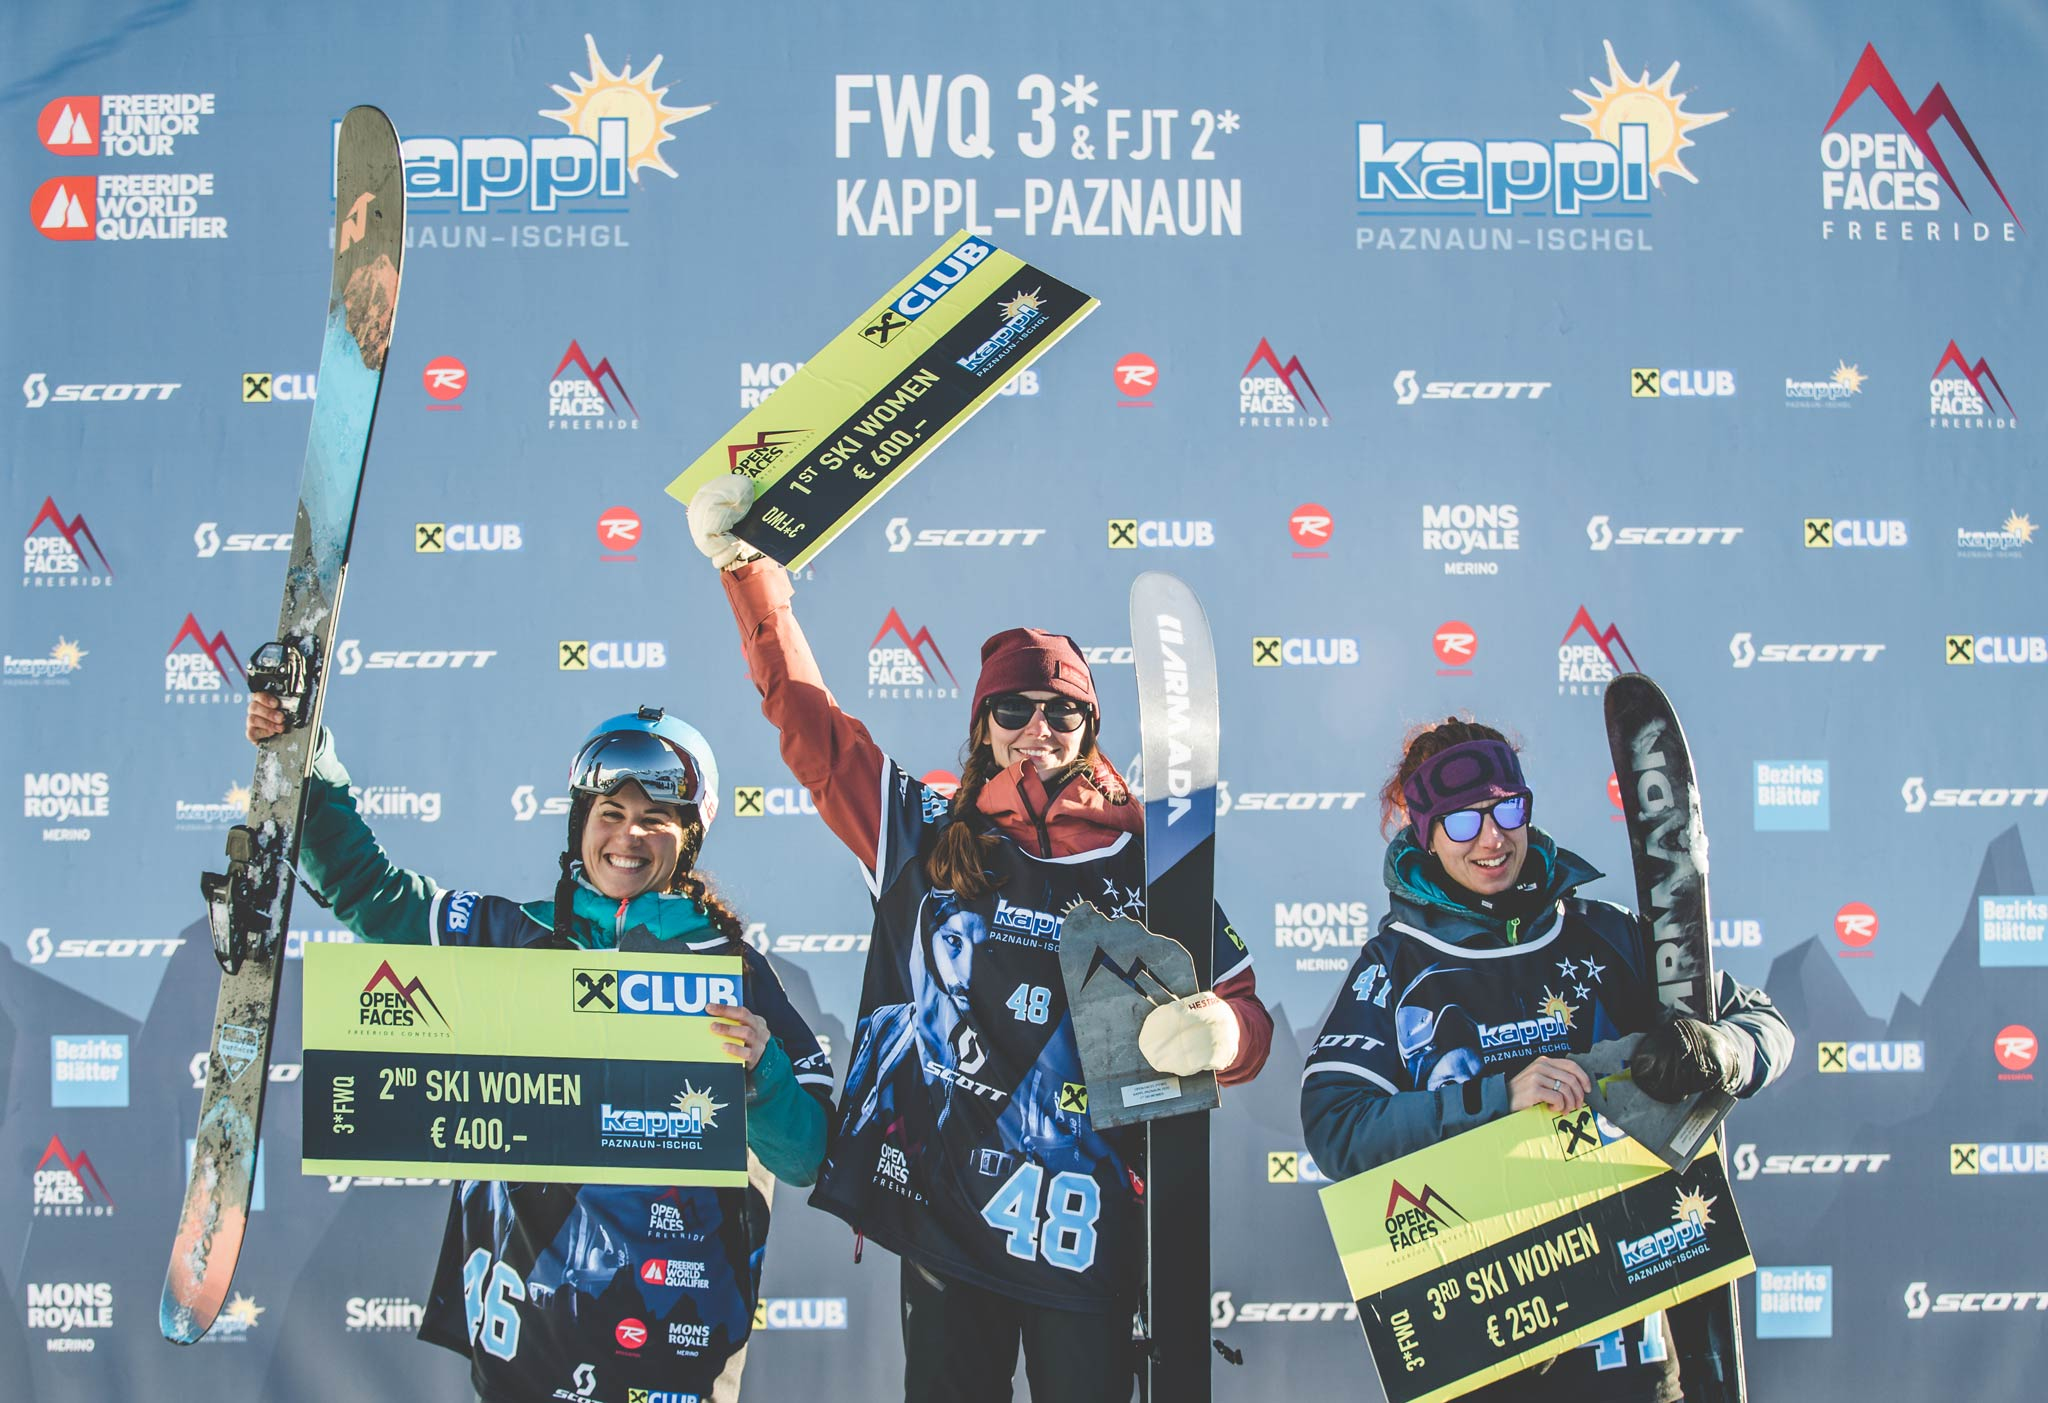 Die drei besten Frauen in Kappl (2020): Valeria Apostolo (ITA), Malene Madson (DEN), Katerina Kalinova (CZE) - Foto: Mia Knoll / Open Faces